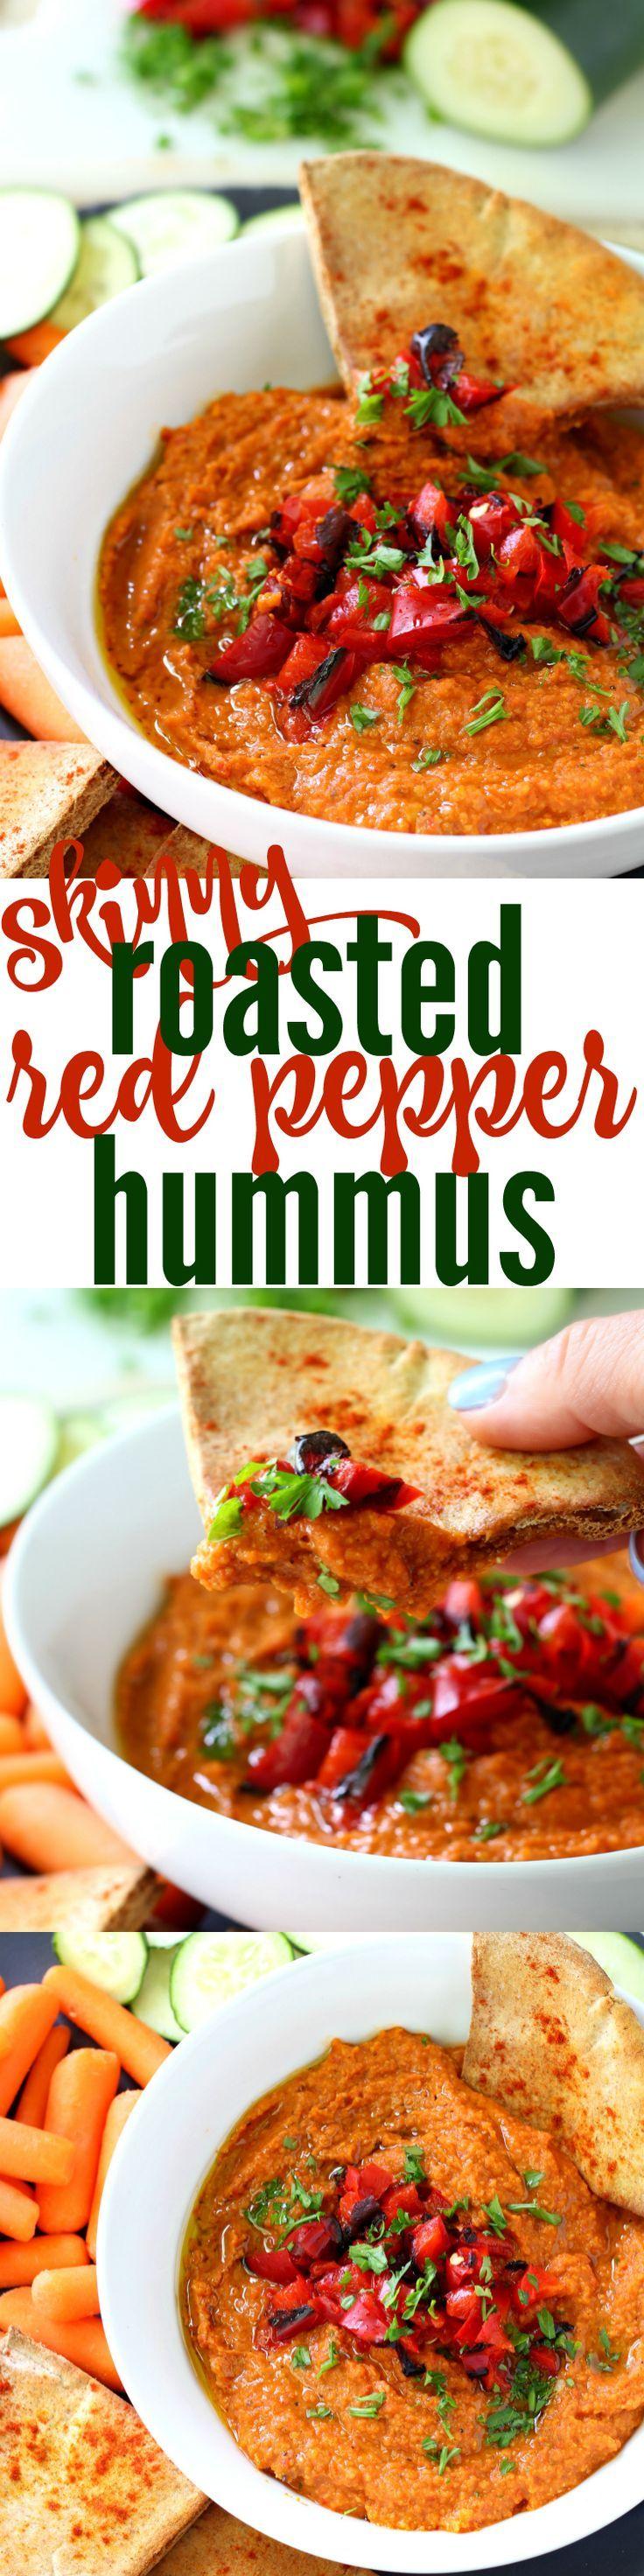 Skinny Roasted Red Pepper Hummus Recipe Red Pepper Hummus